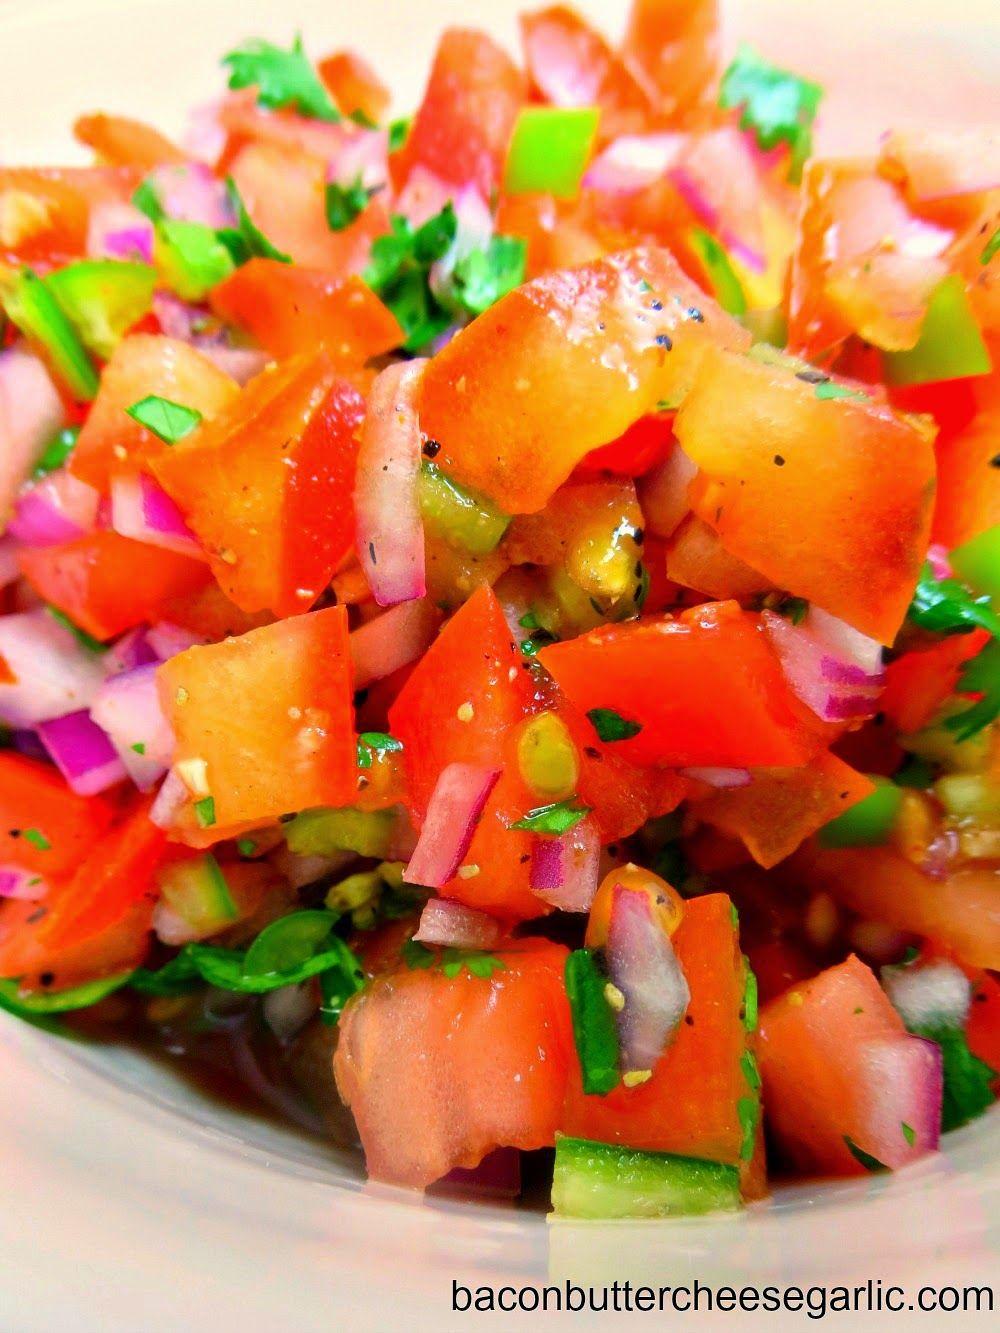 If you've never had Pico de Gallo, it's a fresh little salsa or condiment for…